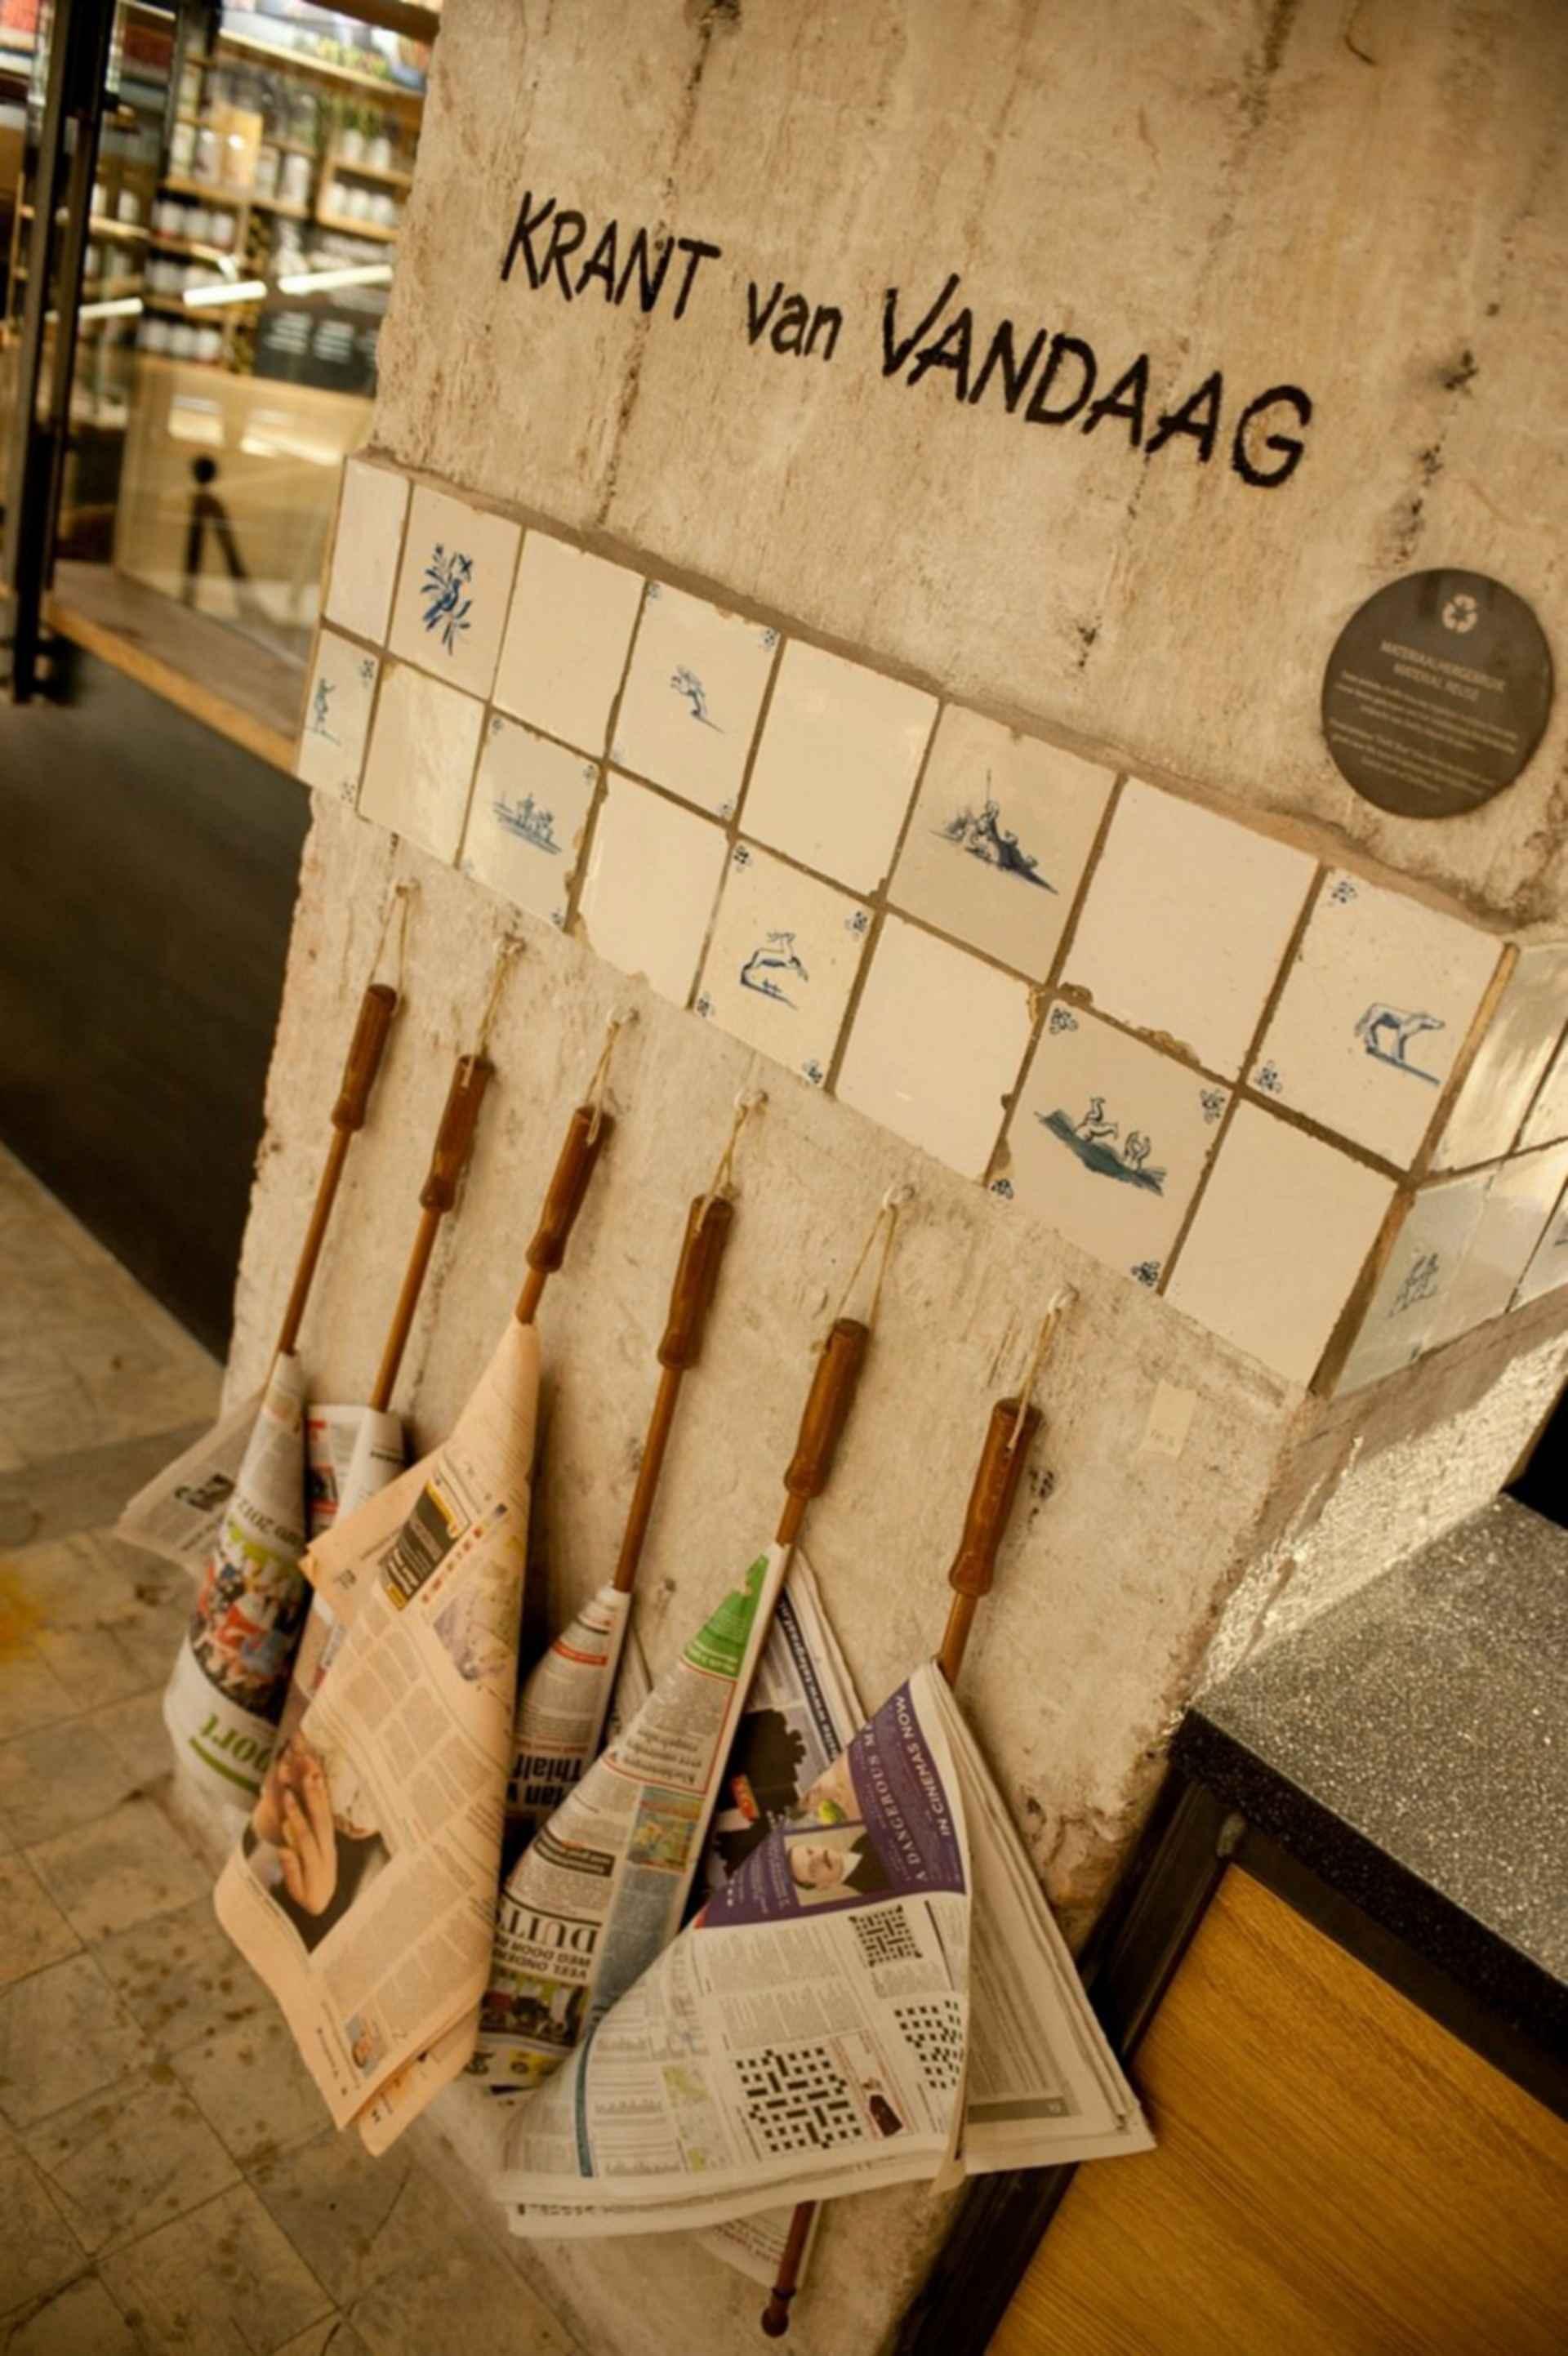 Amsterdam Starbucks - Newspaper Storage